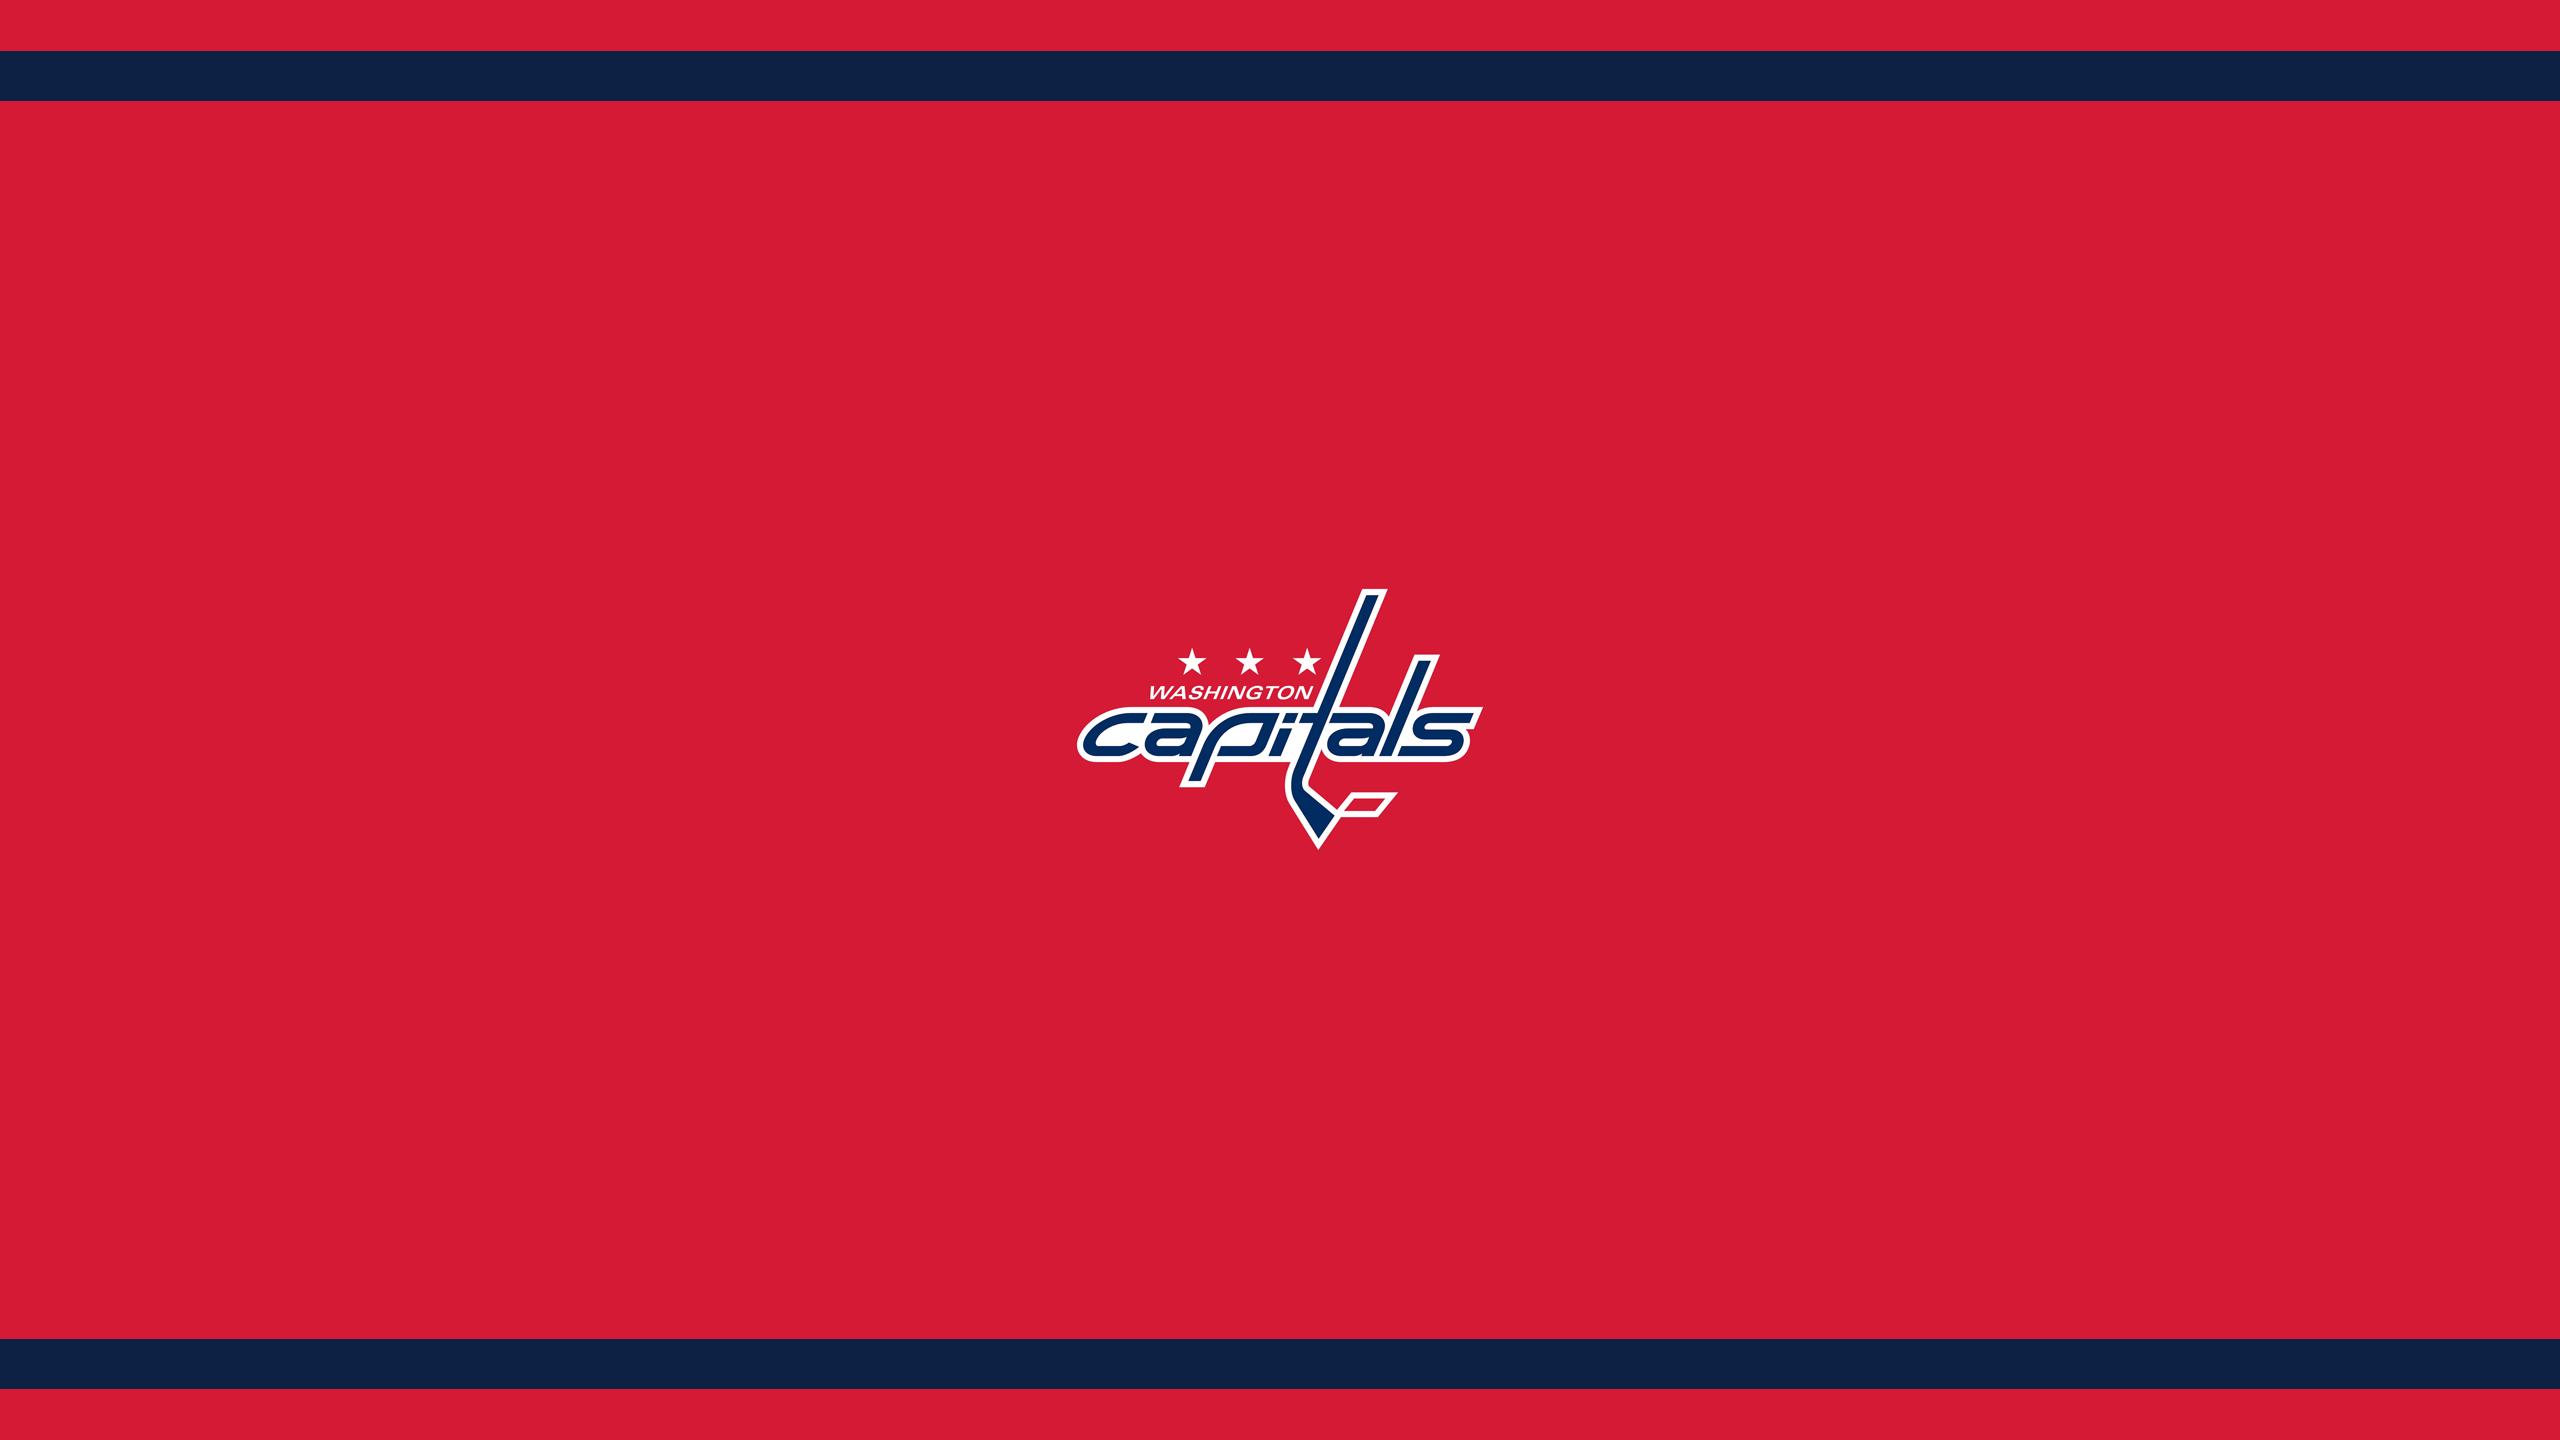 Washington Capitals (Away)